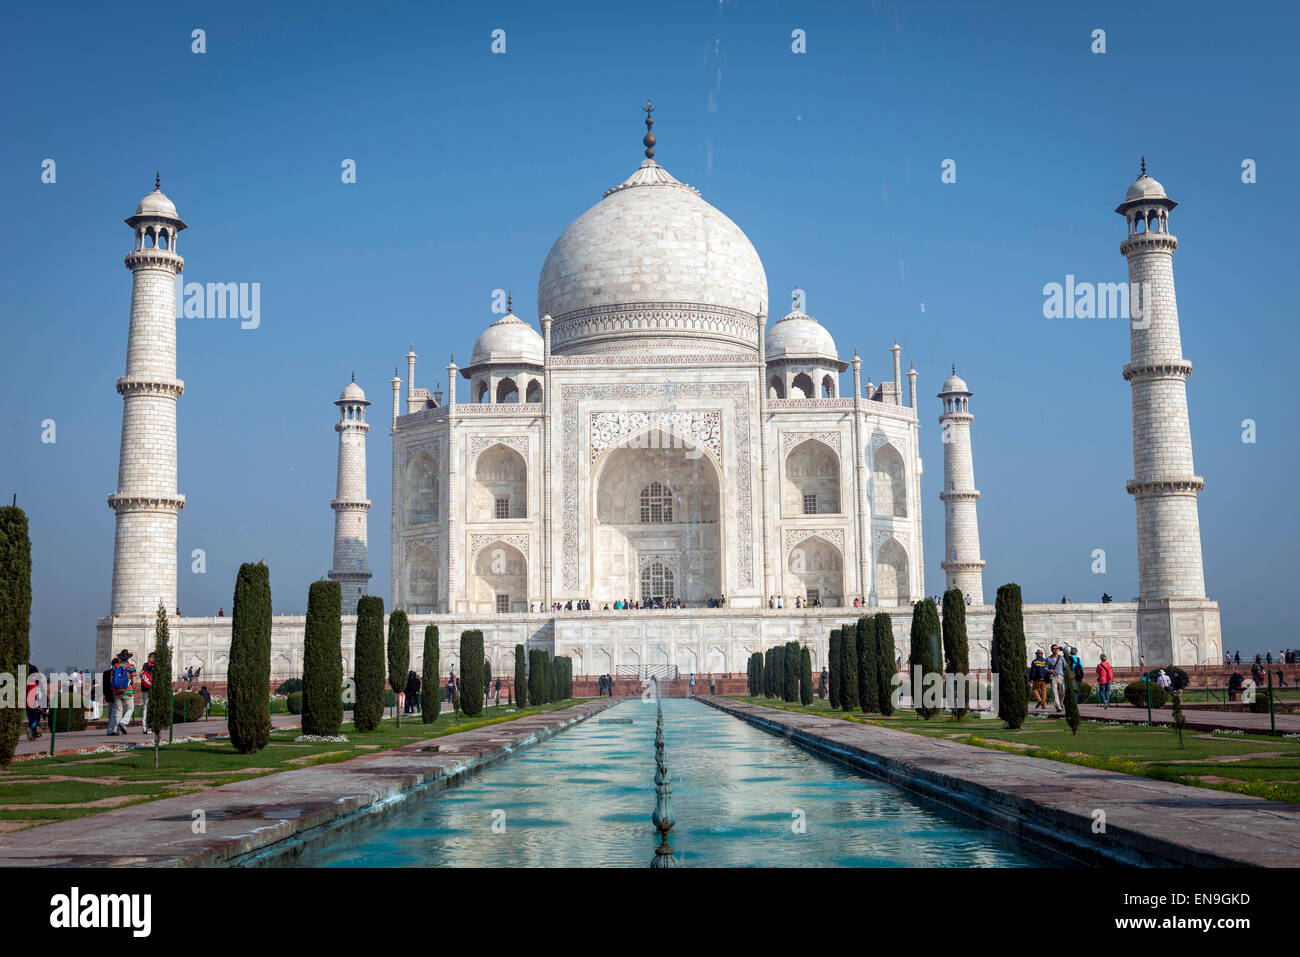 Das Taj Mahal, Agra, Indien Stockbild